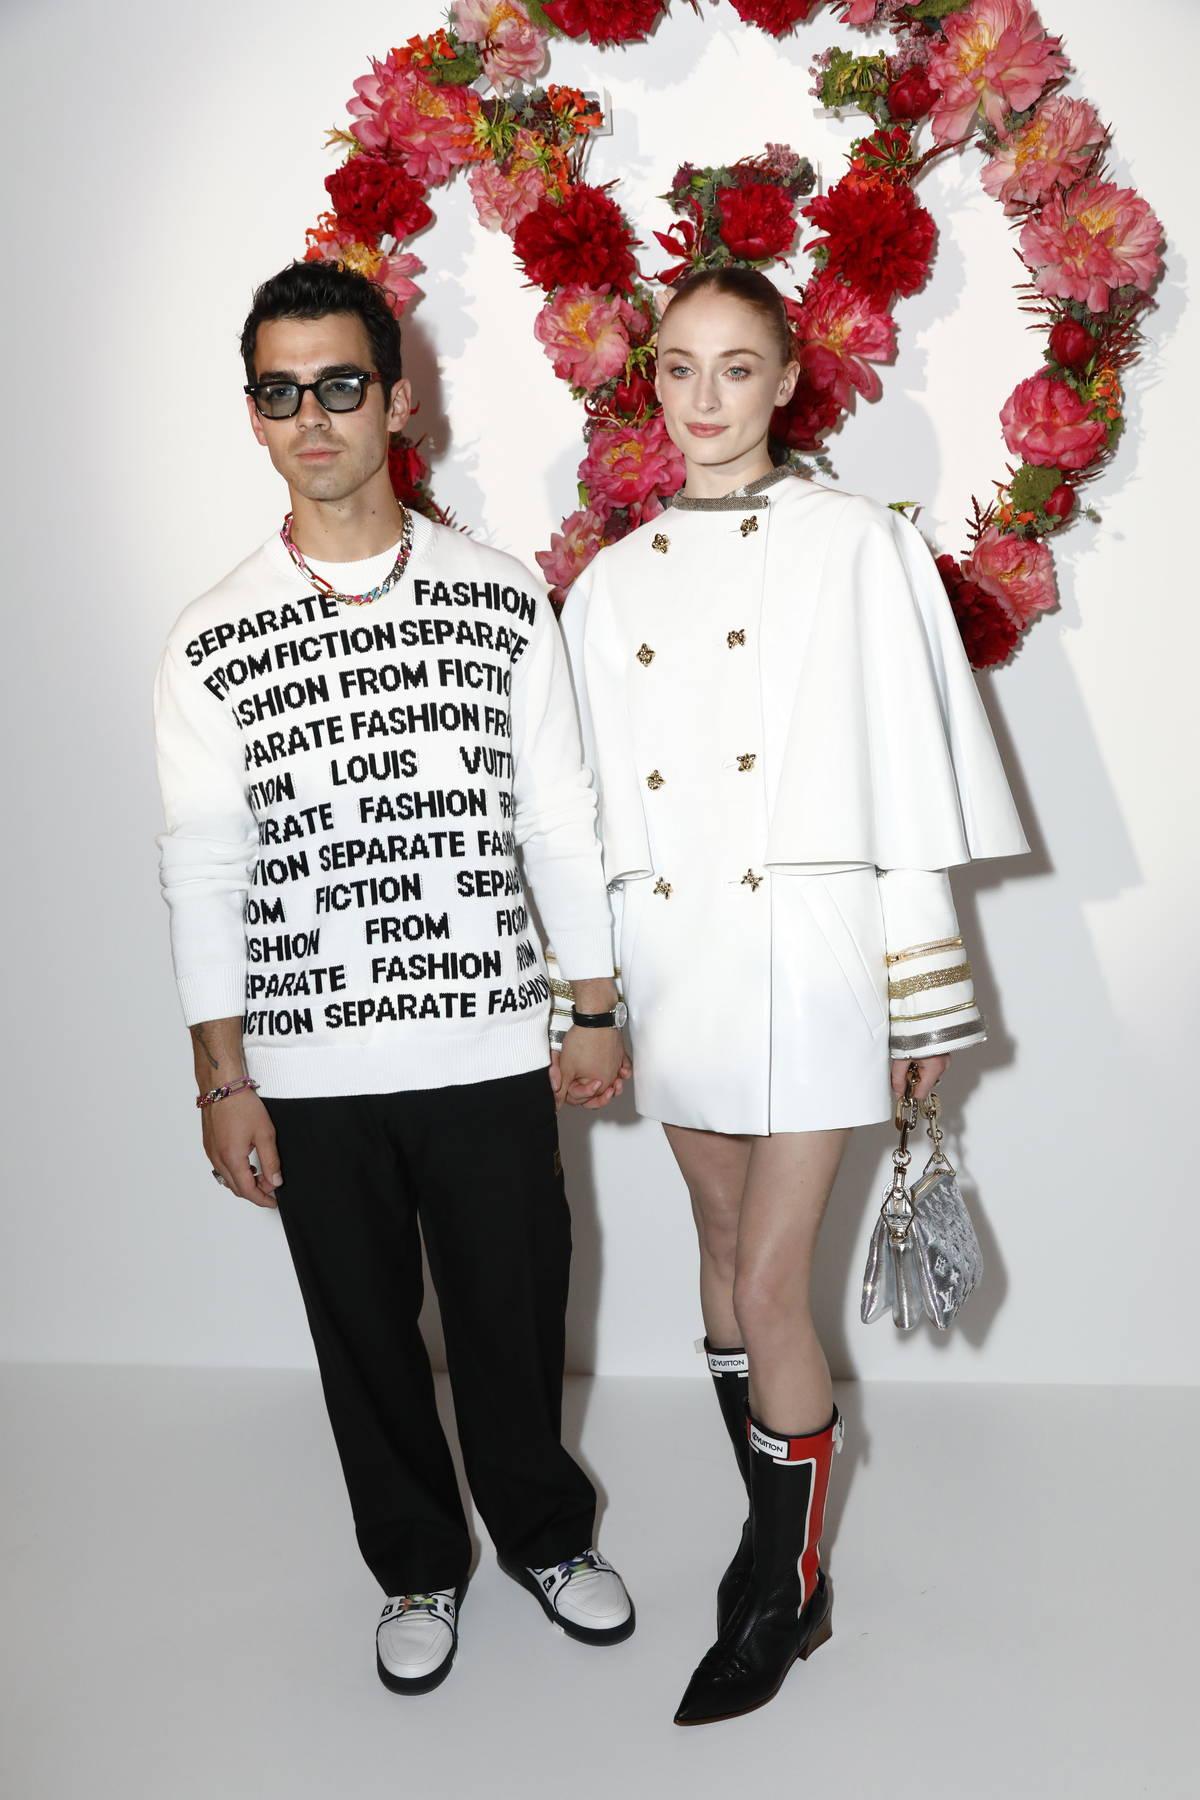 Sophie Turner and Joe Jonas attend the Louis Vuitton Fragrance Dinner at the Louis Vuitton Foundation in Paris, France